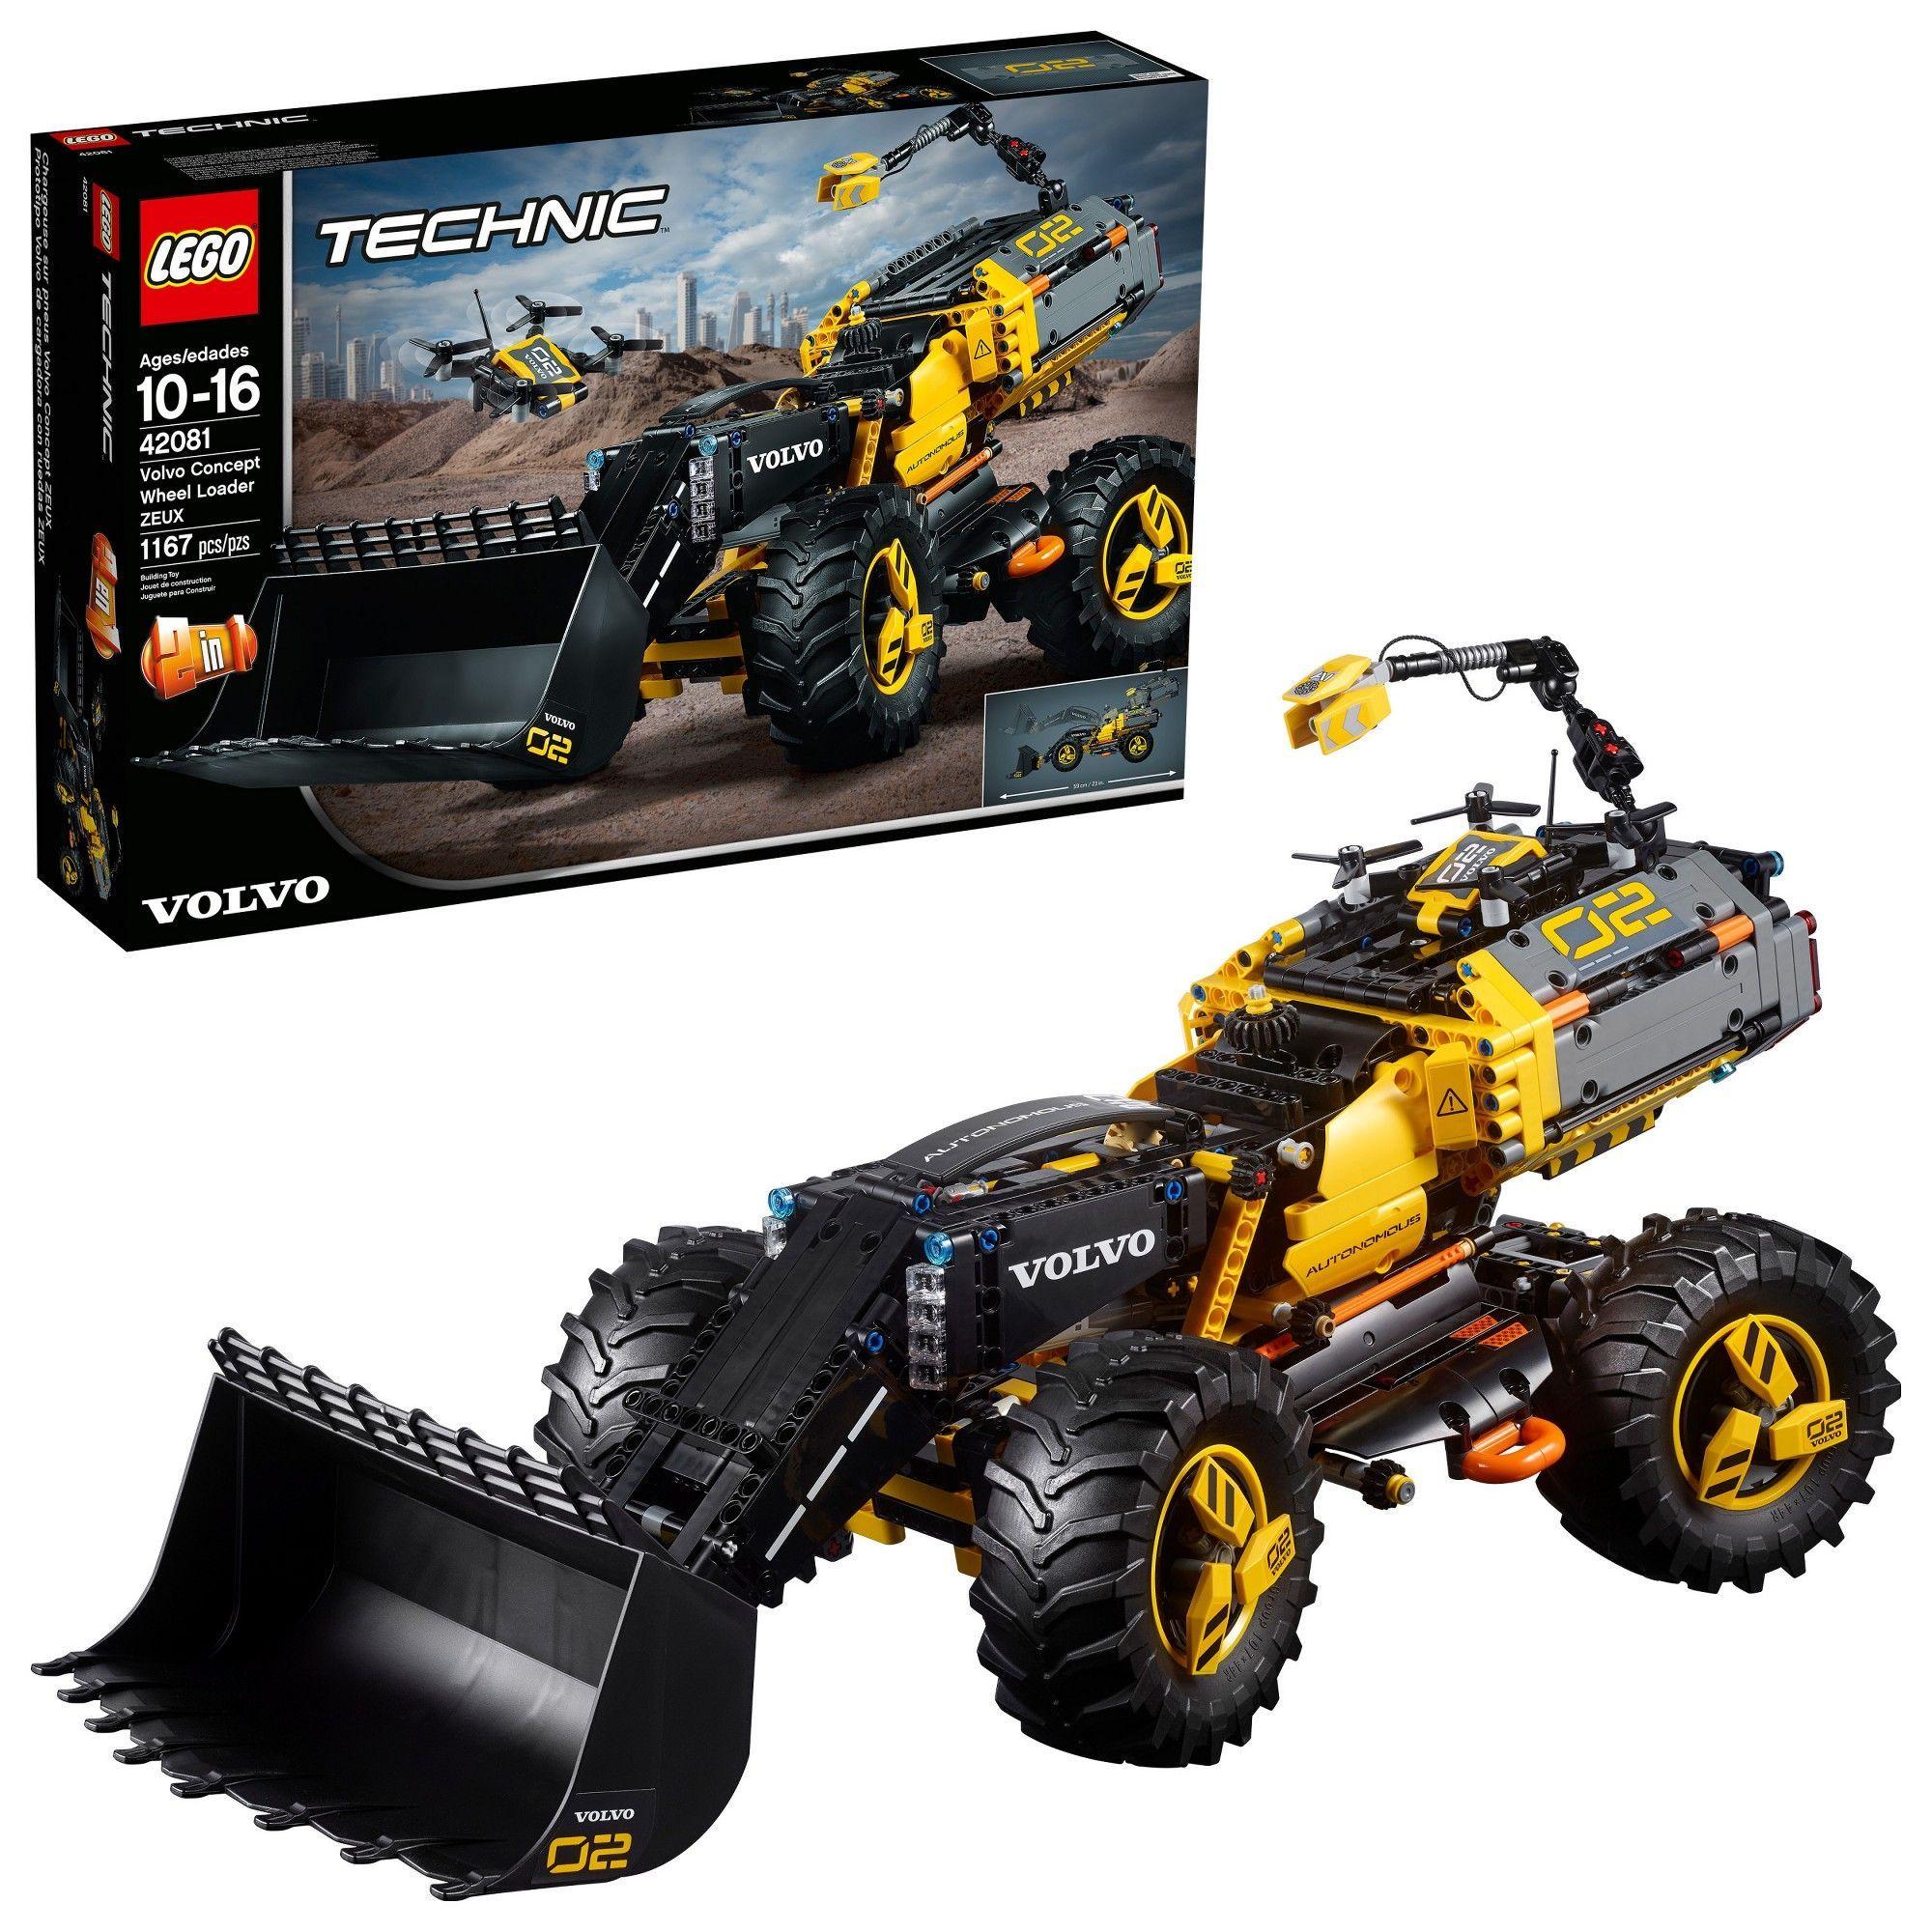 Lego Technic Volvo Concept Wheel Loader Zeux 42081 Lego Technic